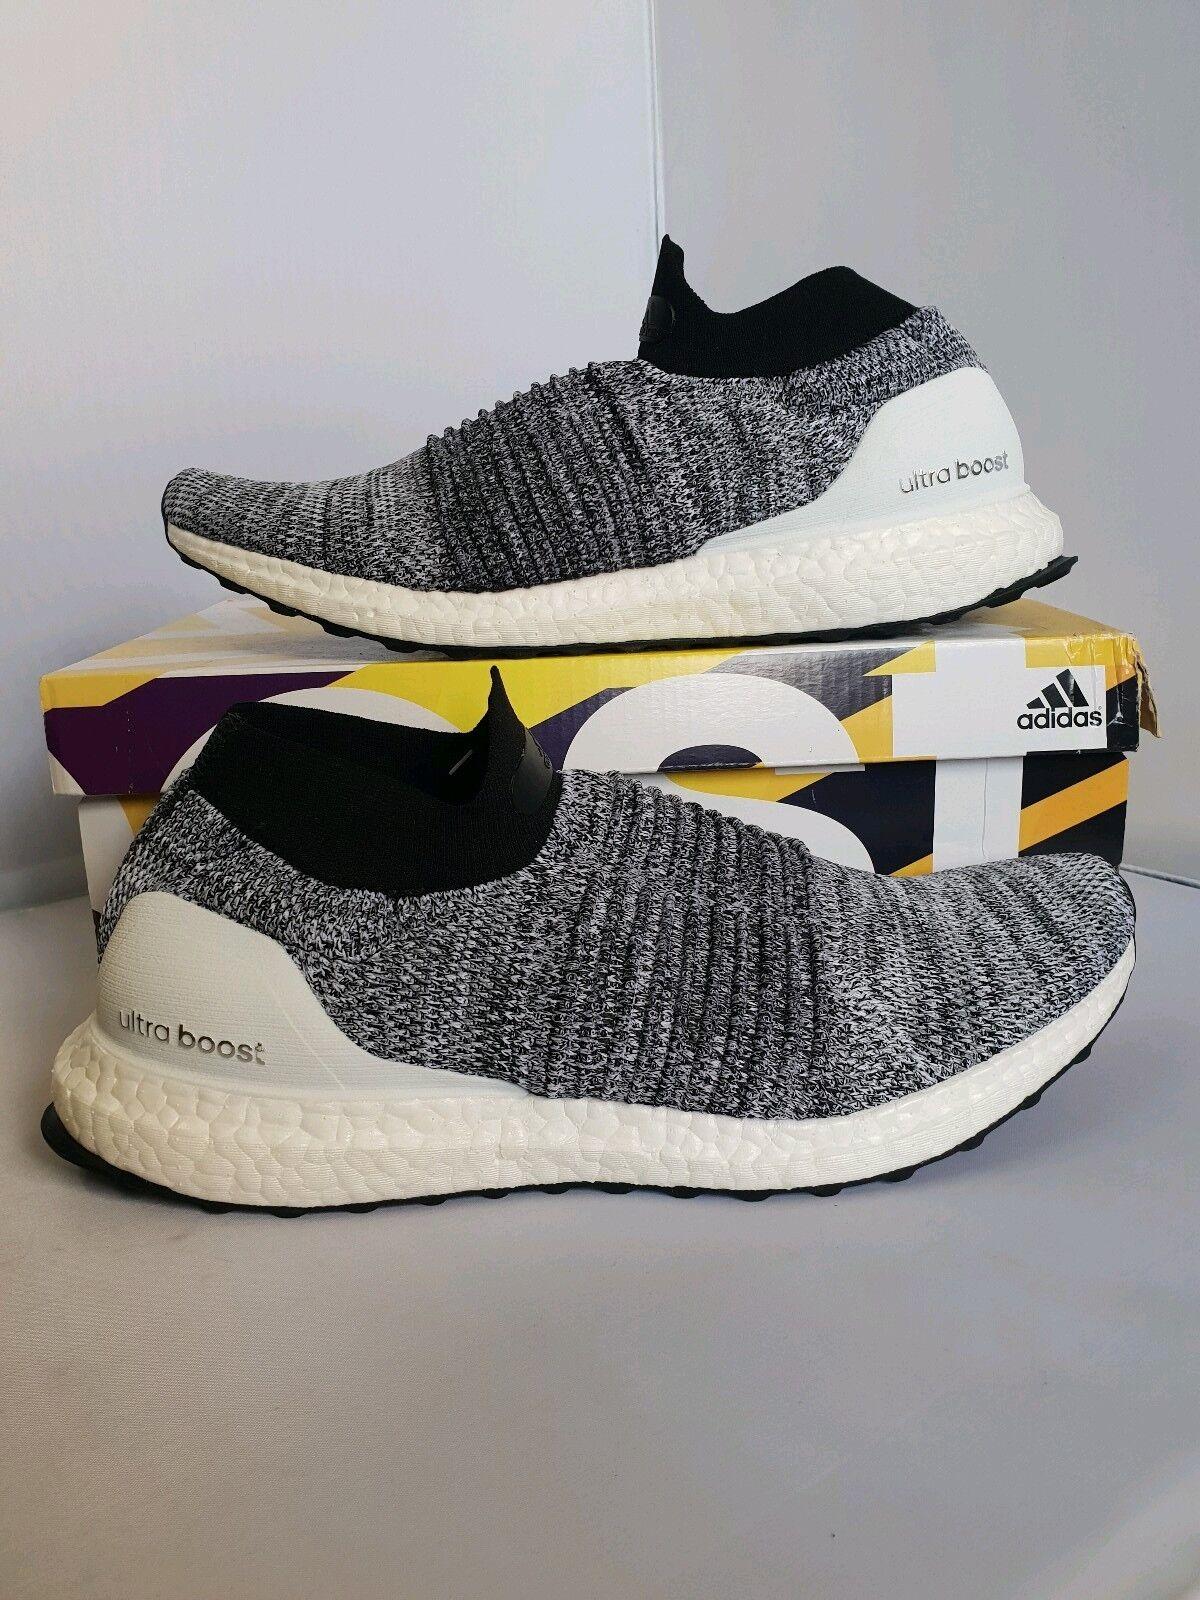 Adidas Ultraboost Laceless Oreo Weiß Weiß schwarz  UK 8.5 US 9 EU 42 2 3  | Auf Verkauf